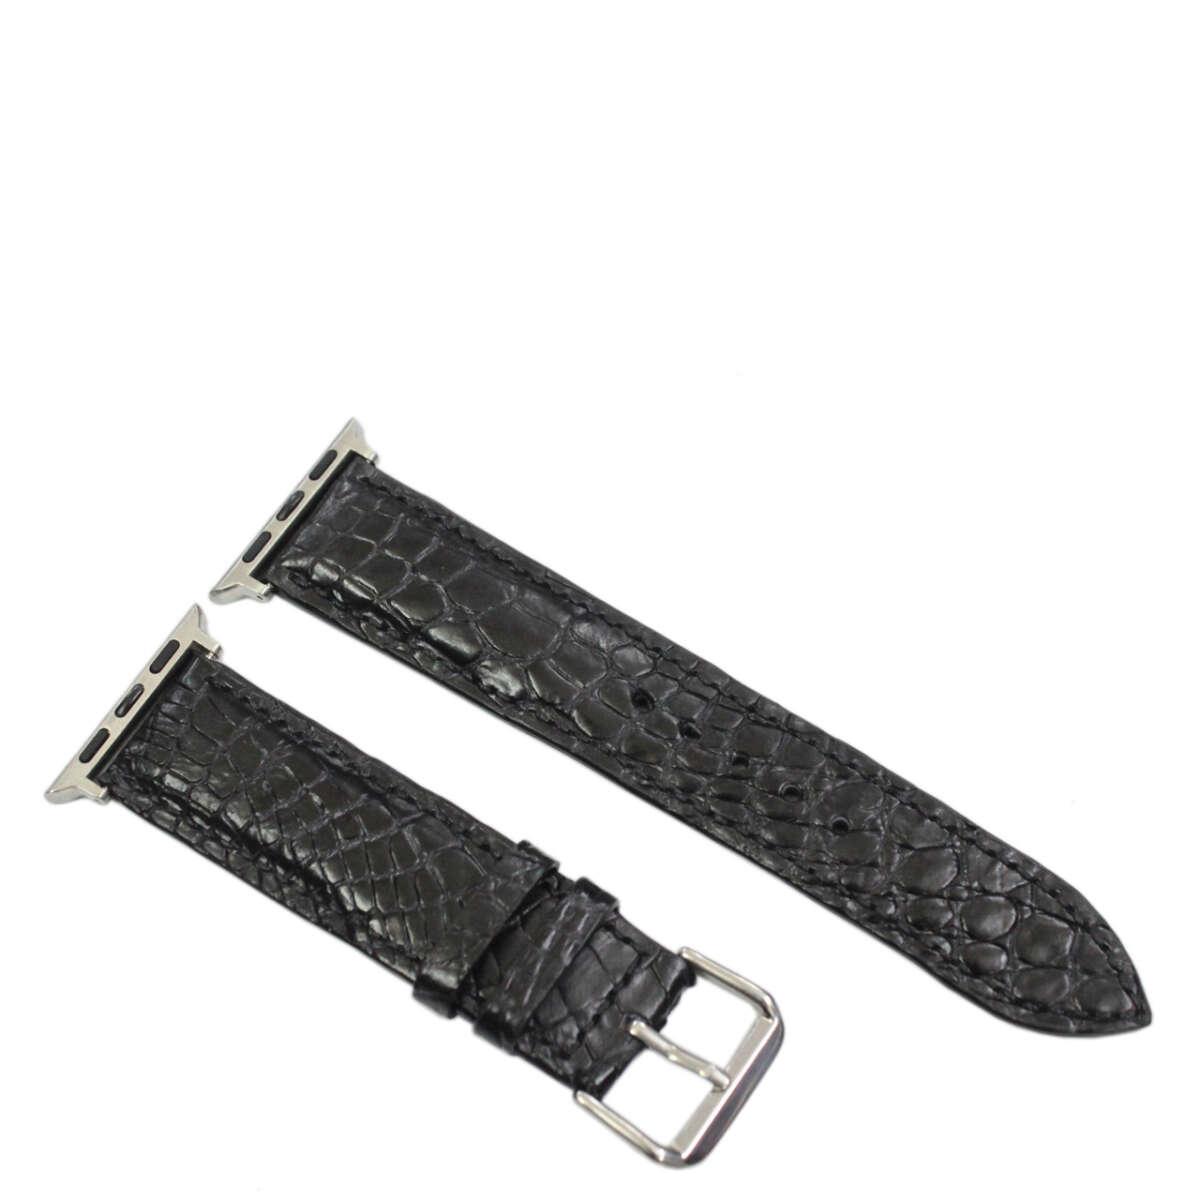 Dây da cá sấu Apple Watch S952a